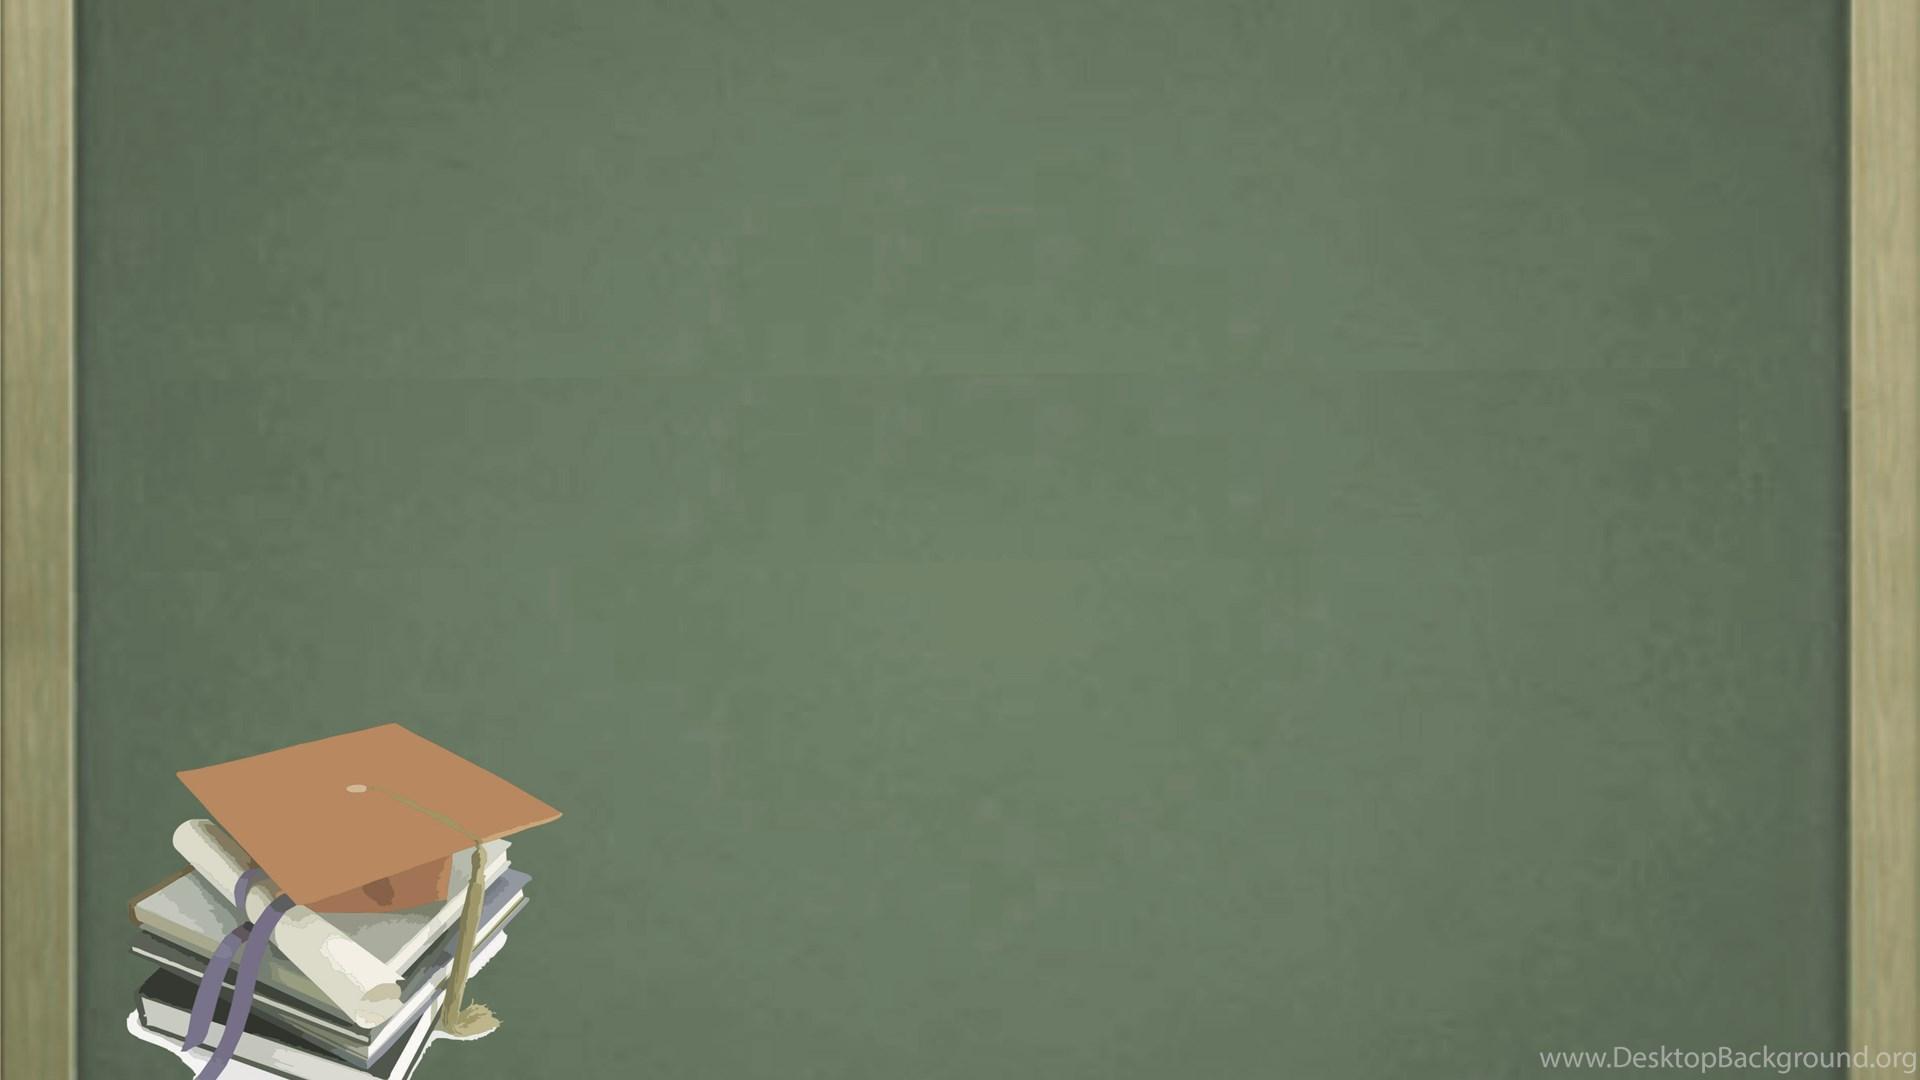 Education Background Images Wallpapers Hd Wide Desktop Background